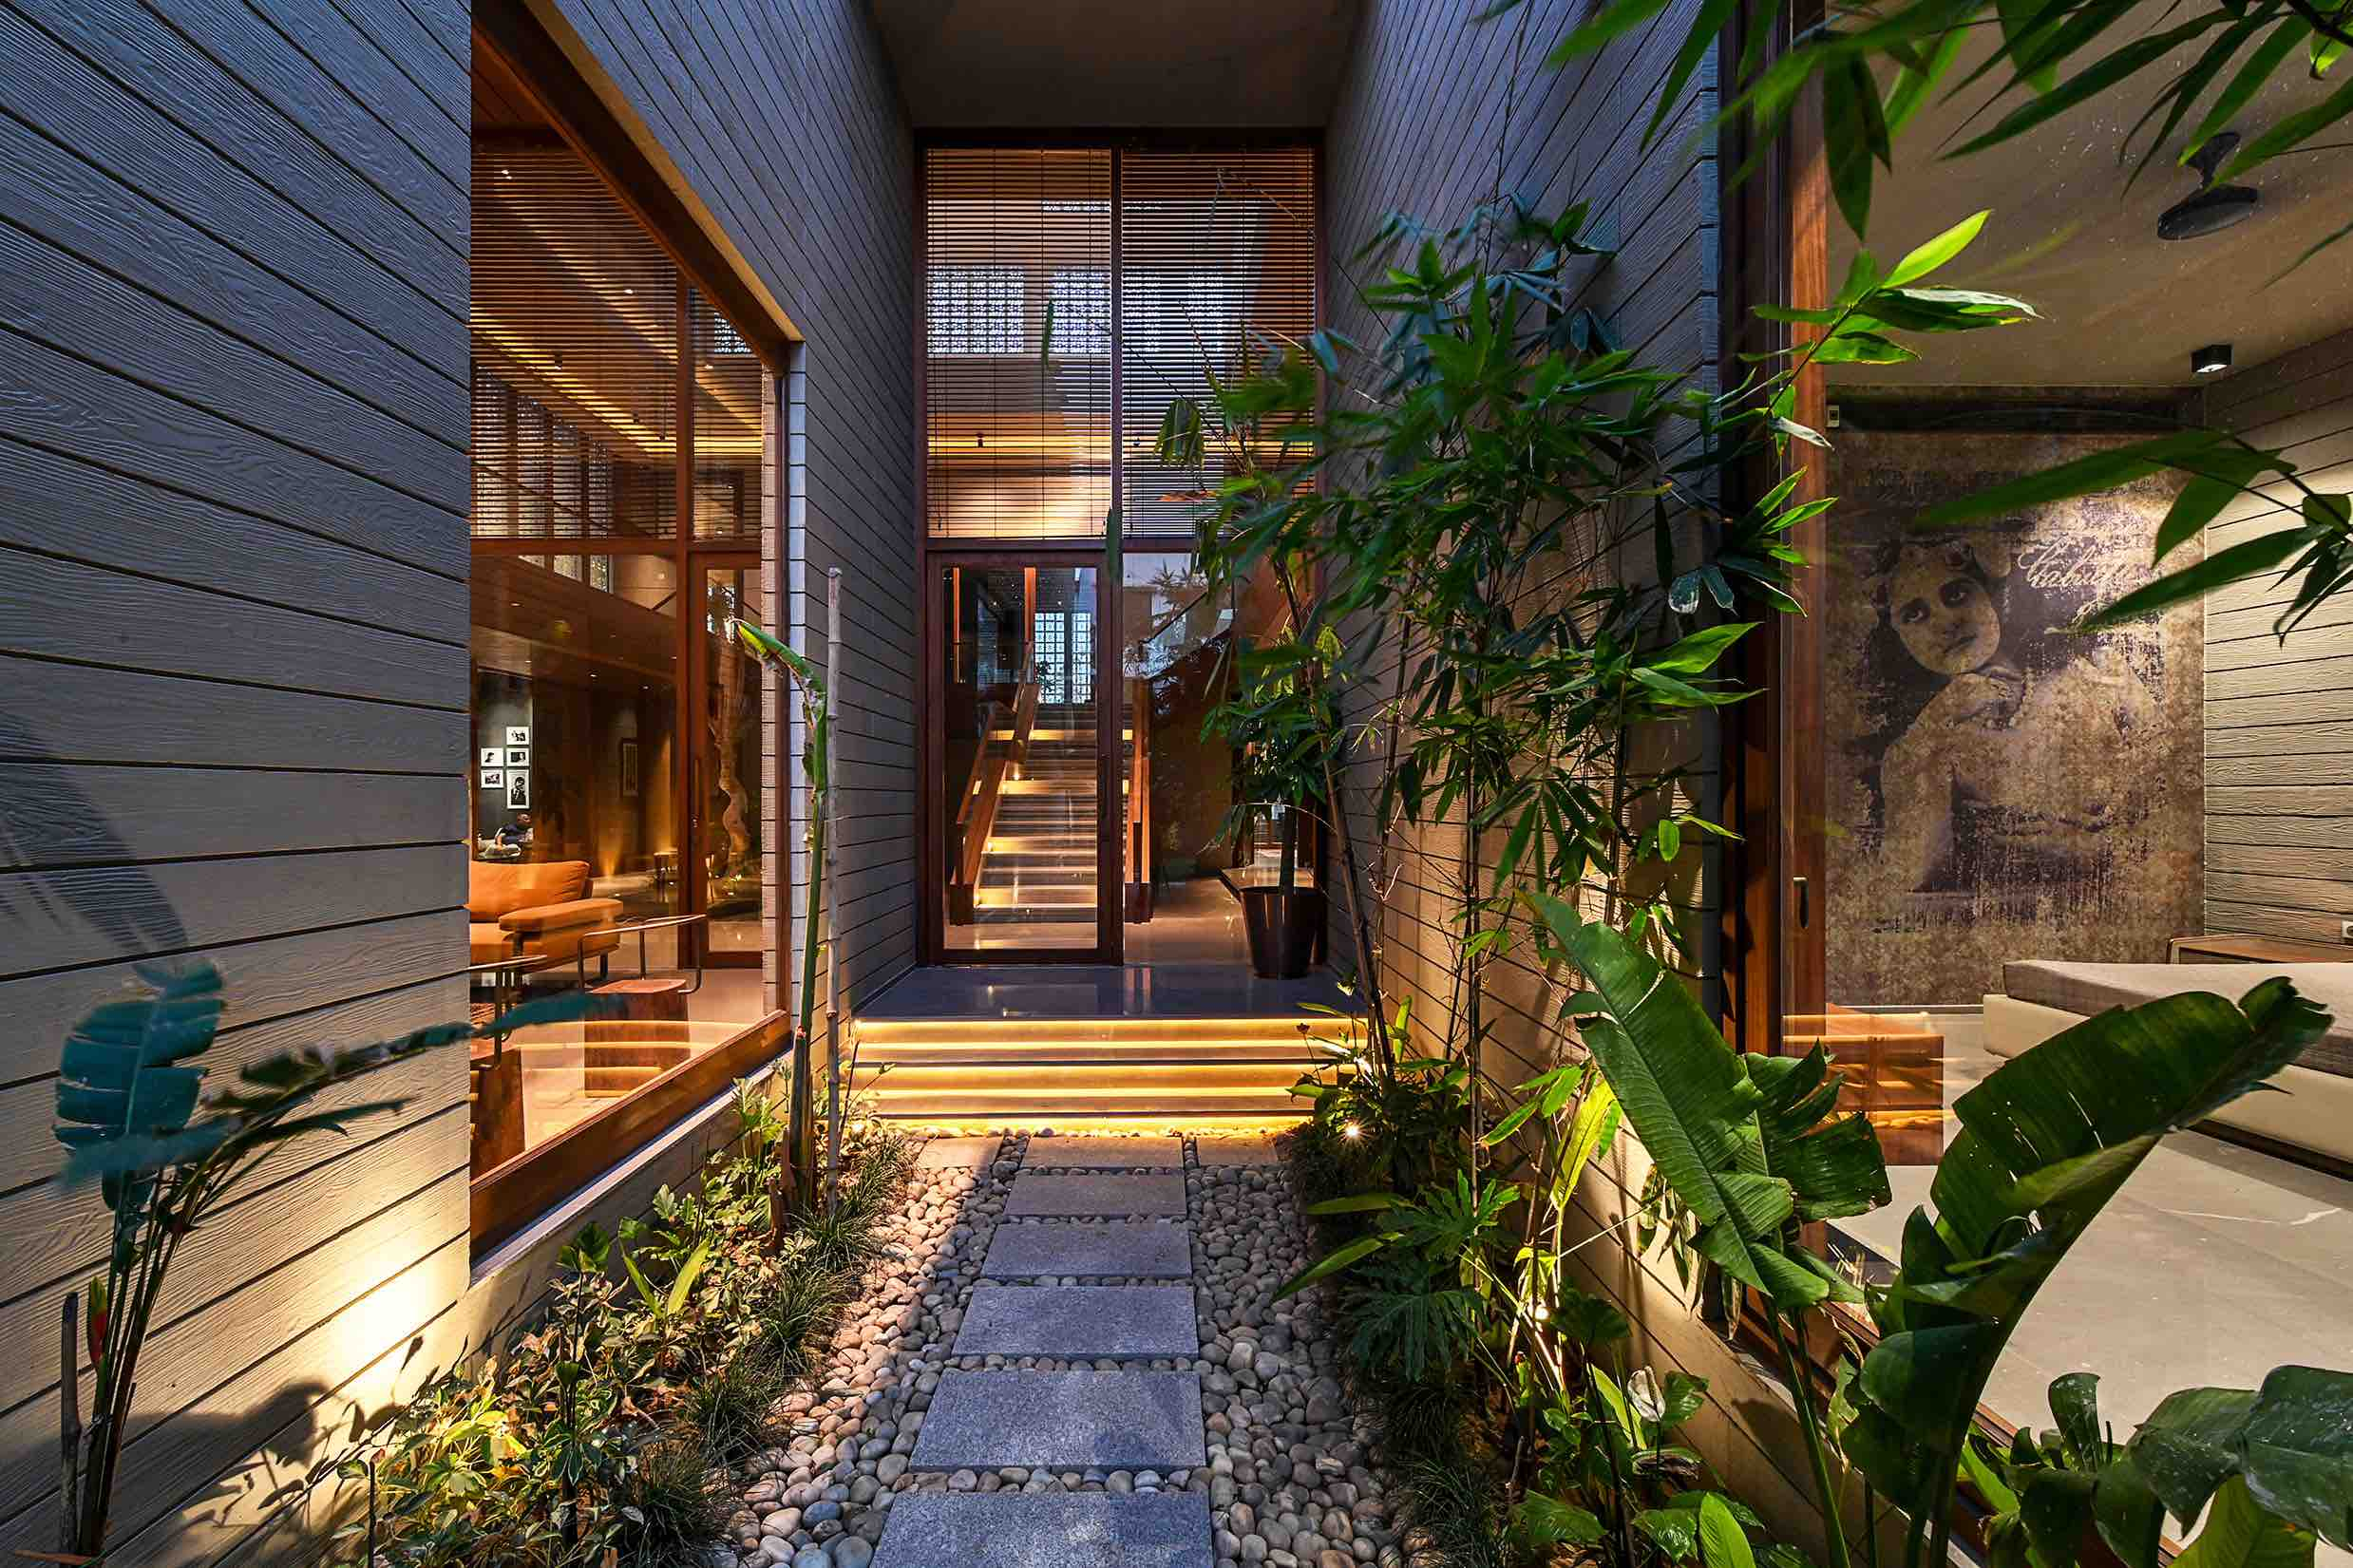 18_Screens_Sanjay_Puri_architects_india_amazingarchitecture_014.jpg